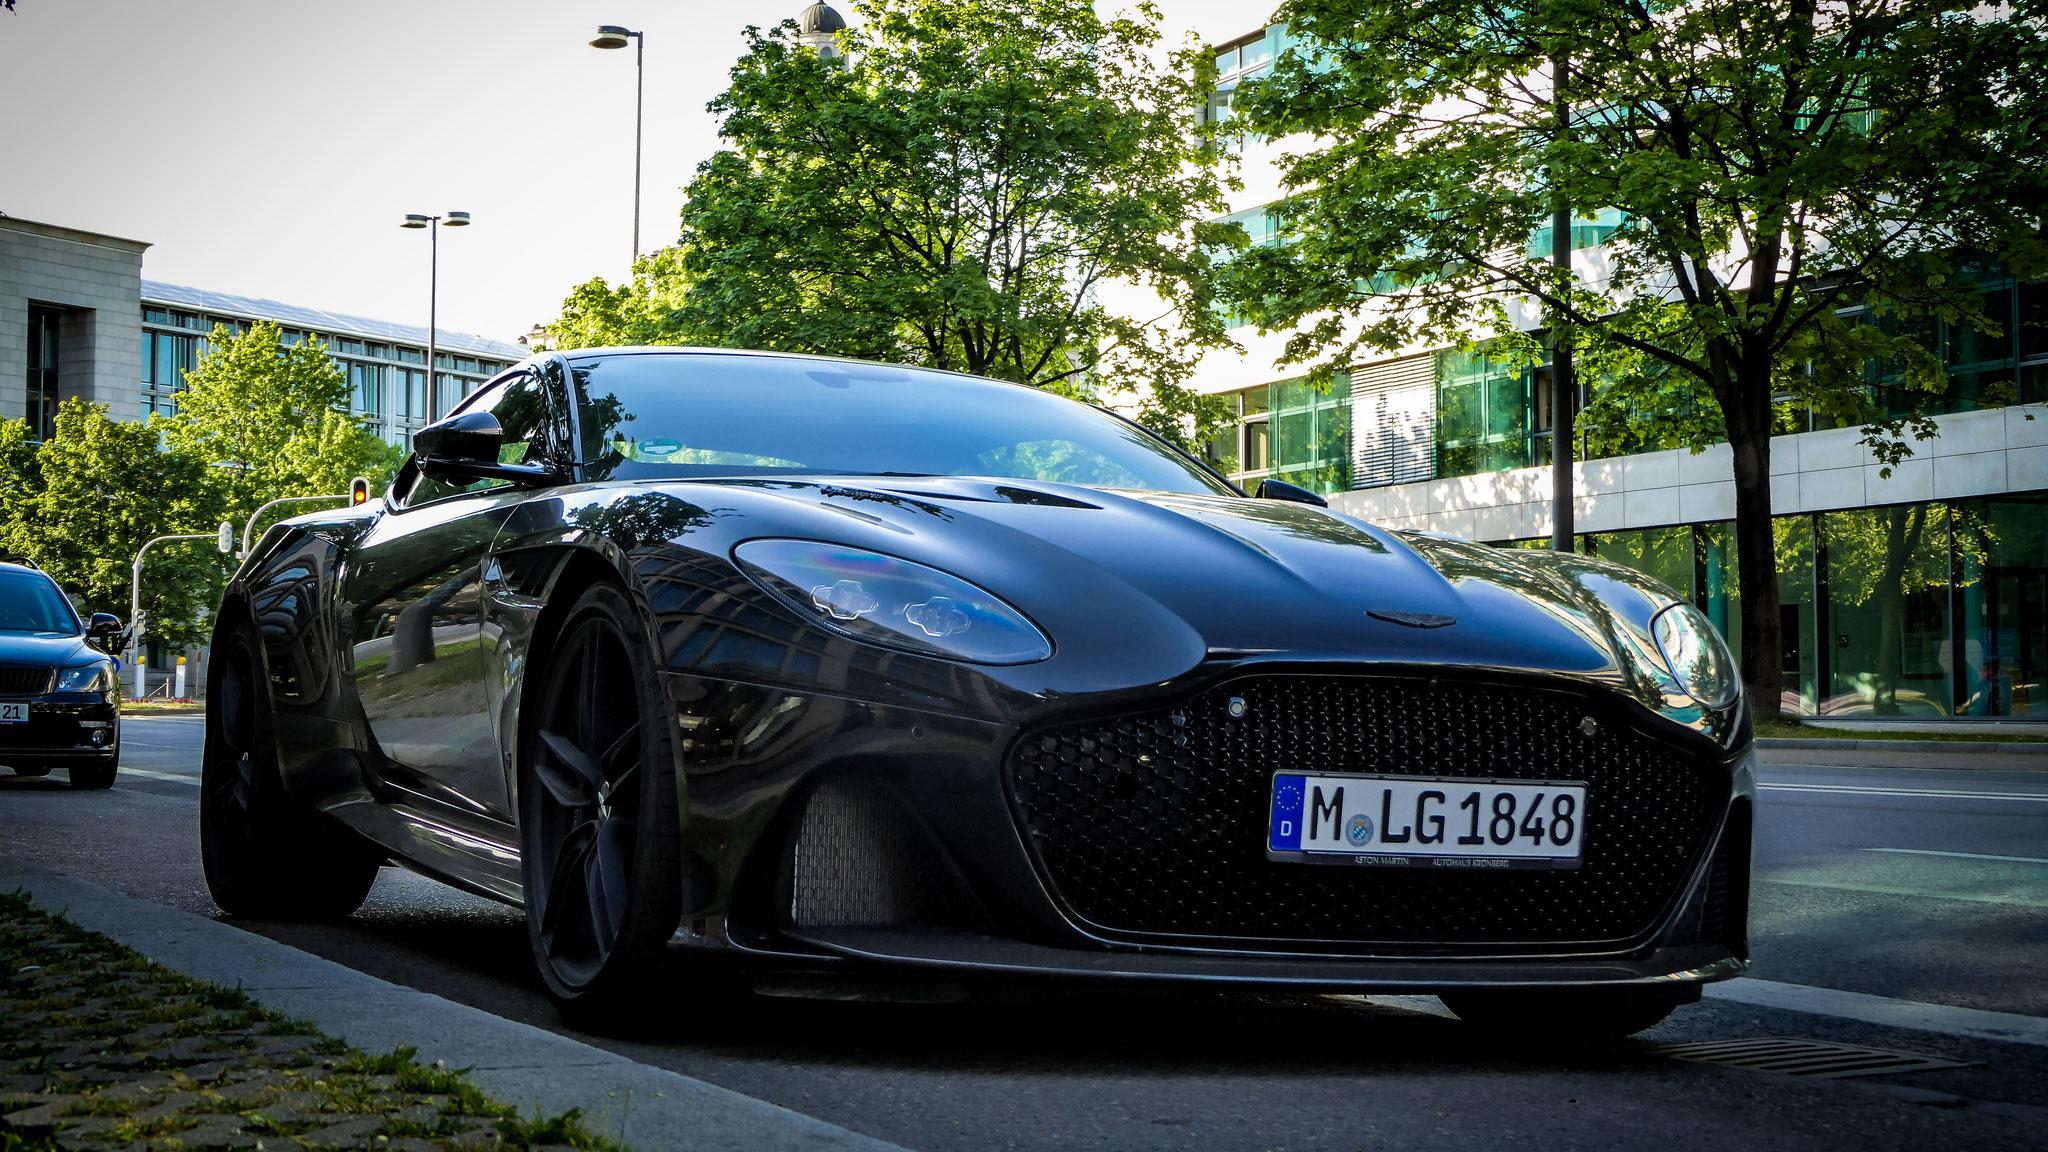 Aston Martin DBS Superleggera - M-LG-1848